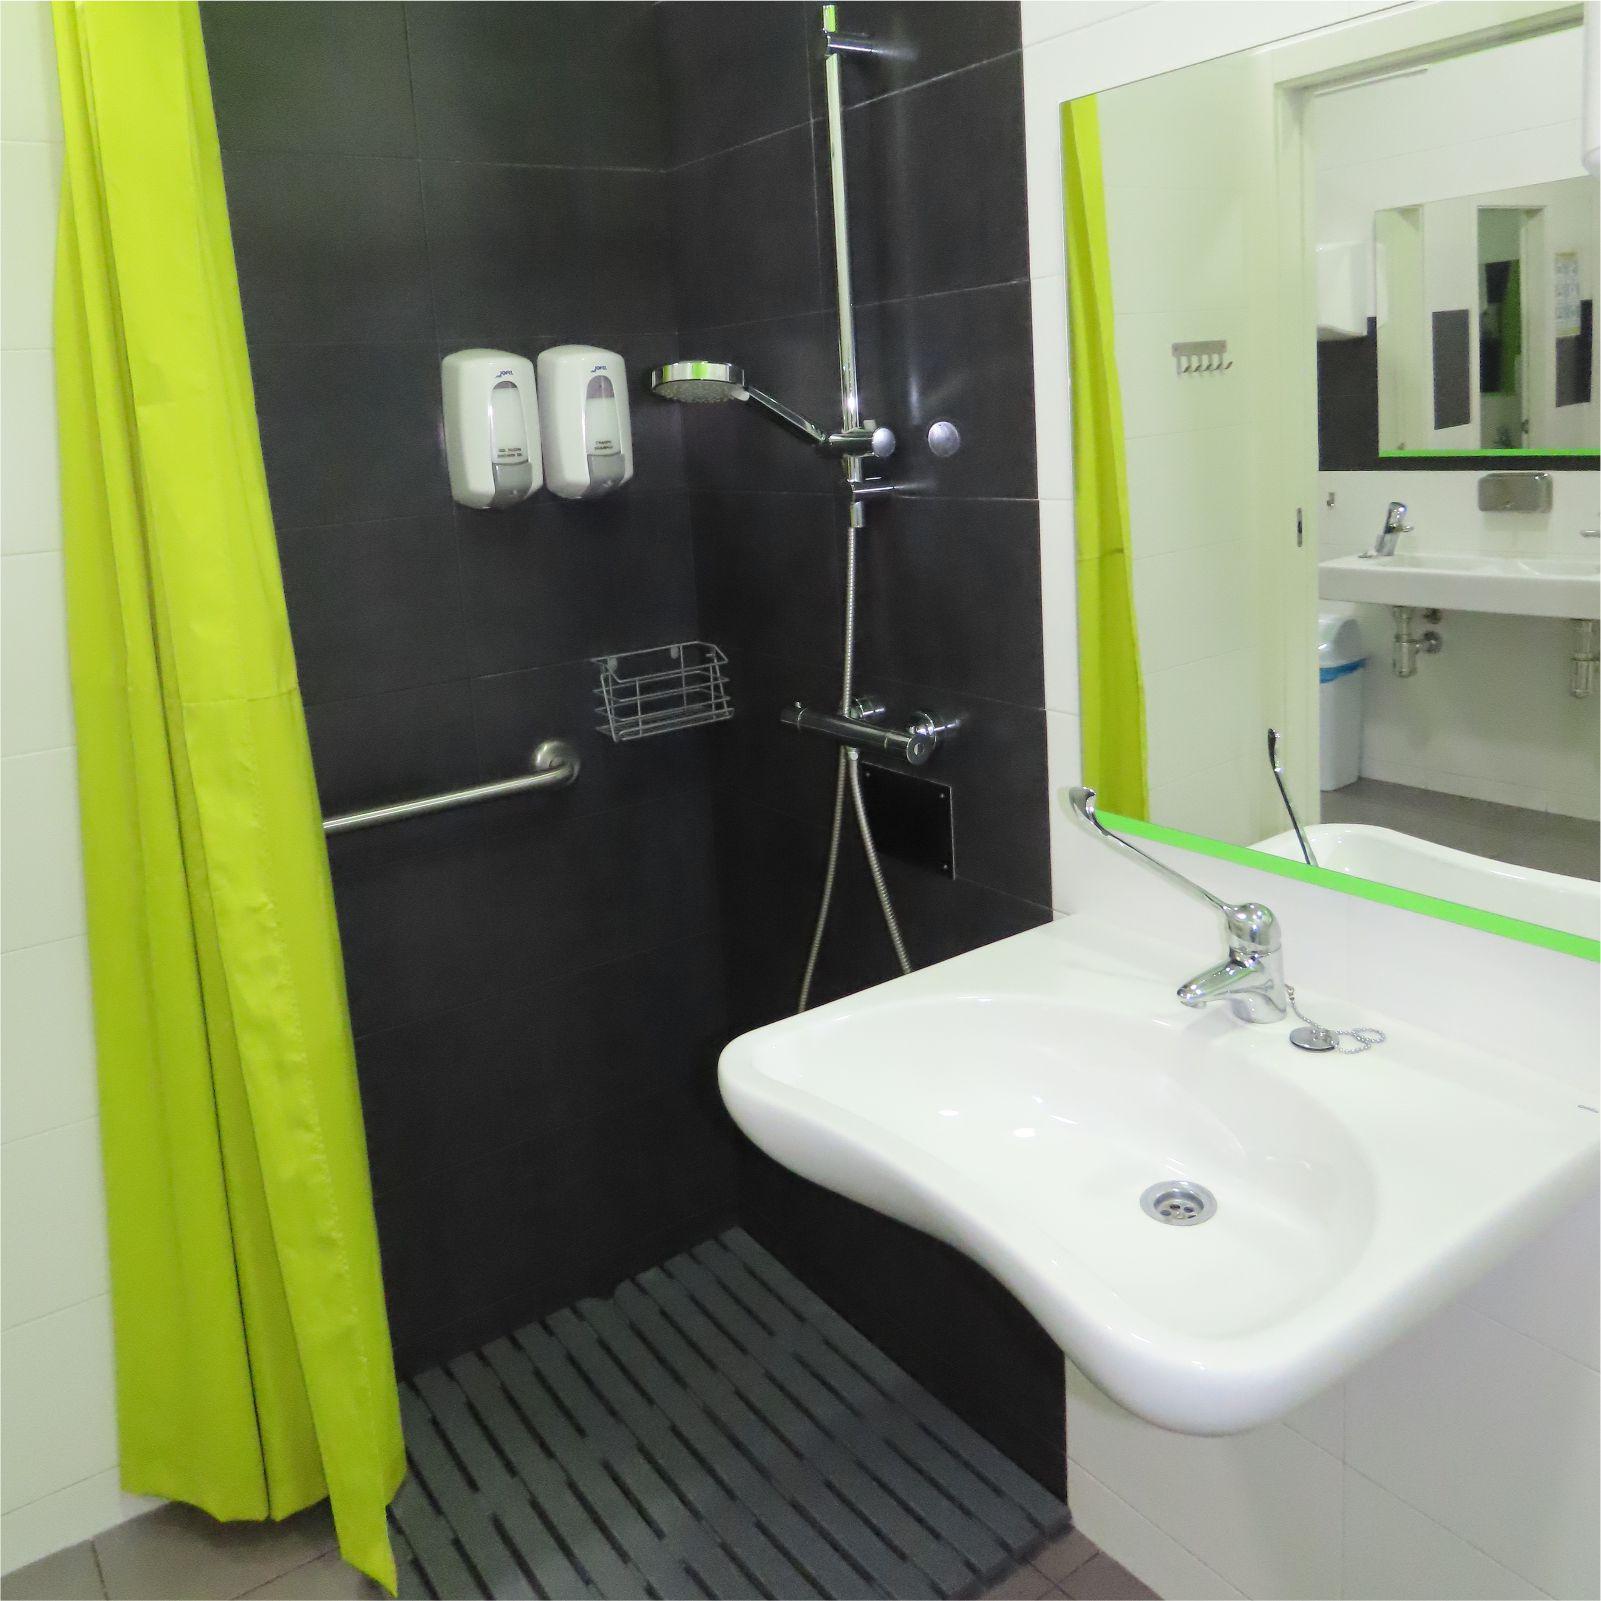 Ducha para discapacitados - Disabled shower